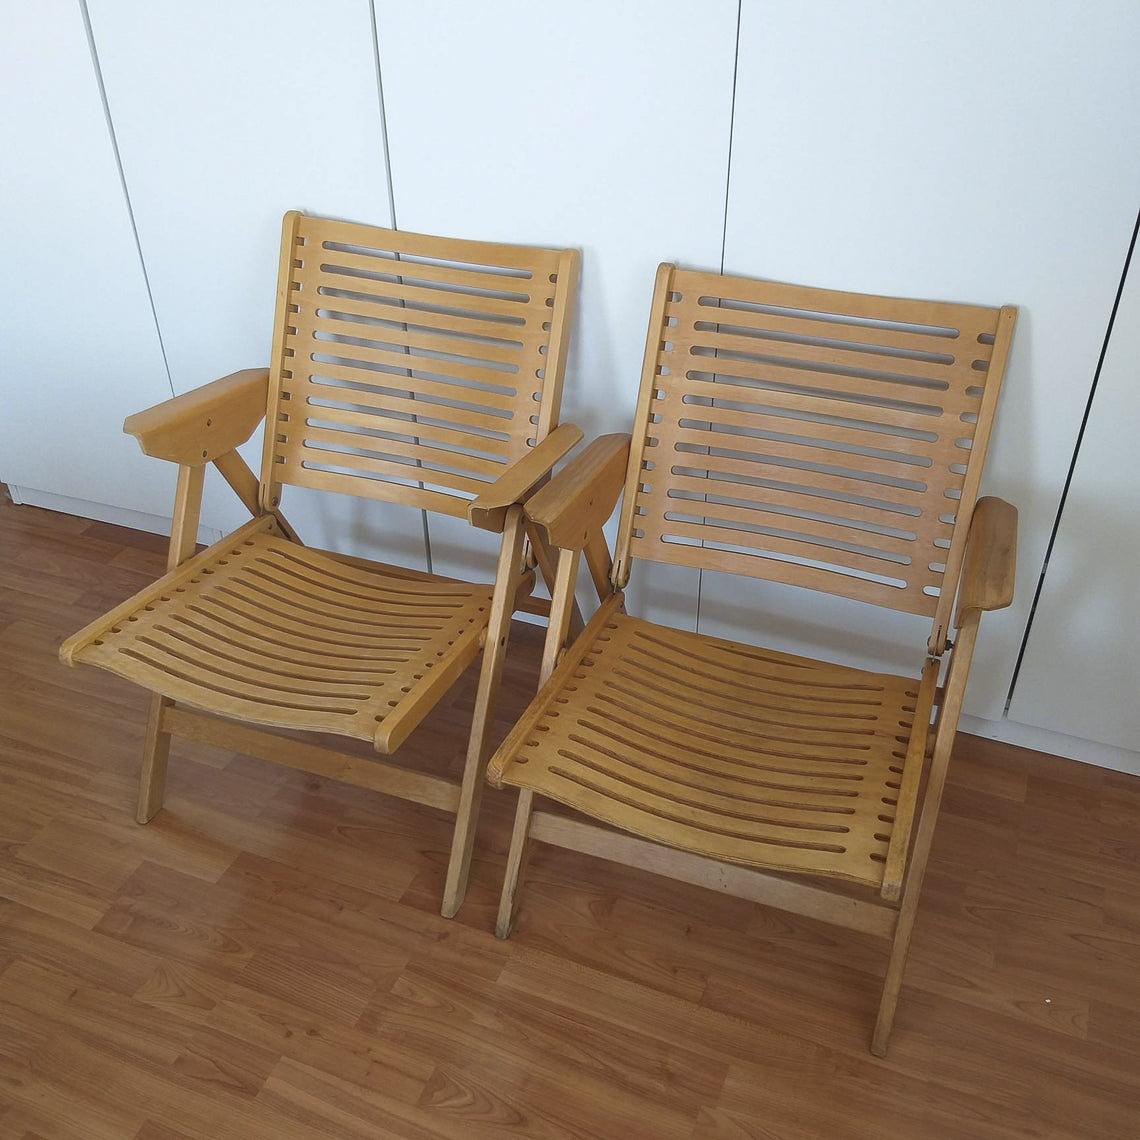 1 of 2 Vintage Rex Chair, Folding Chair, Vintage Easy Chair, Niko Kralj Design, Yugoslavia_